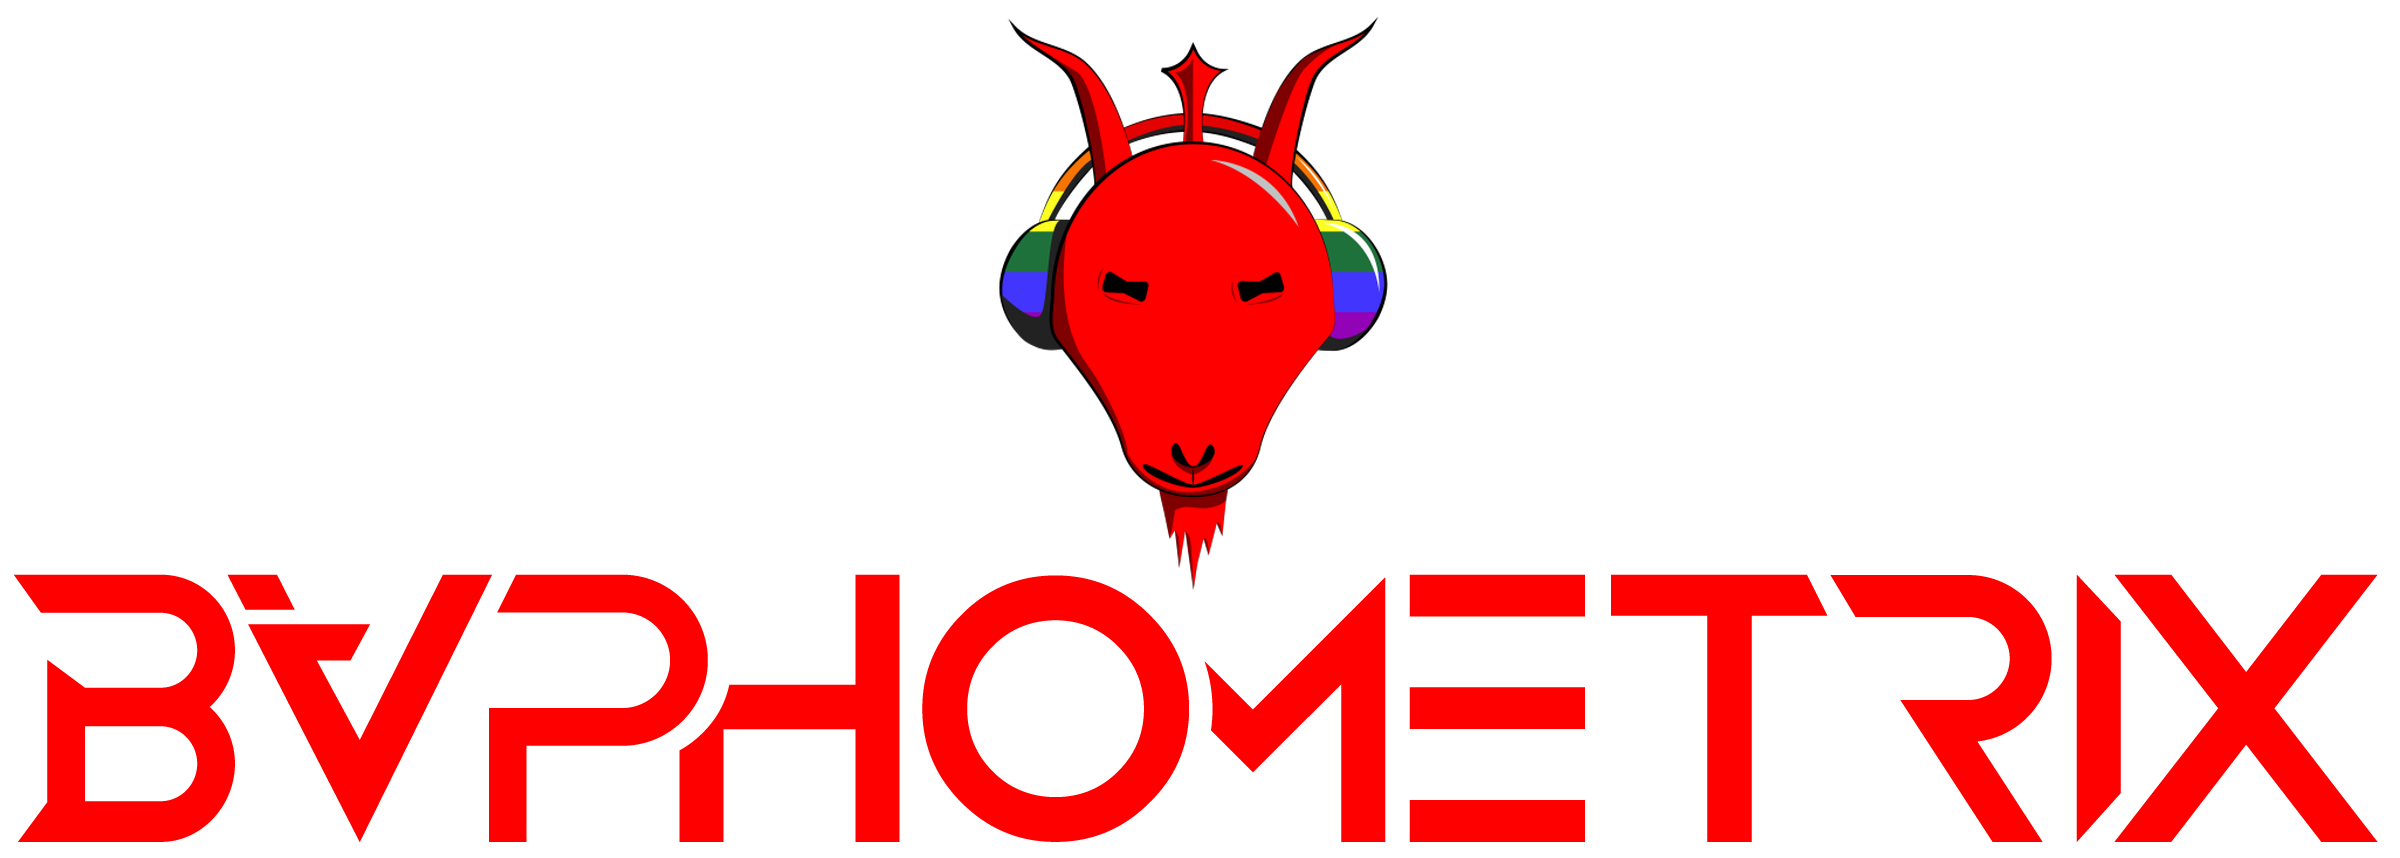 BAPHOMETRIX_Logo-Typeset-Stacked_Orig_2400_x_300_Red.png